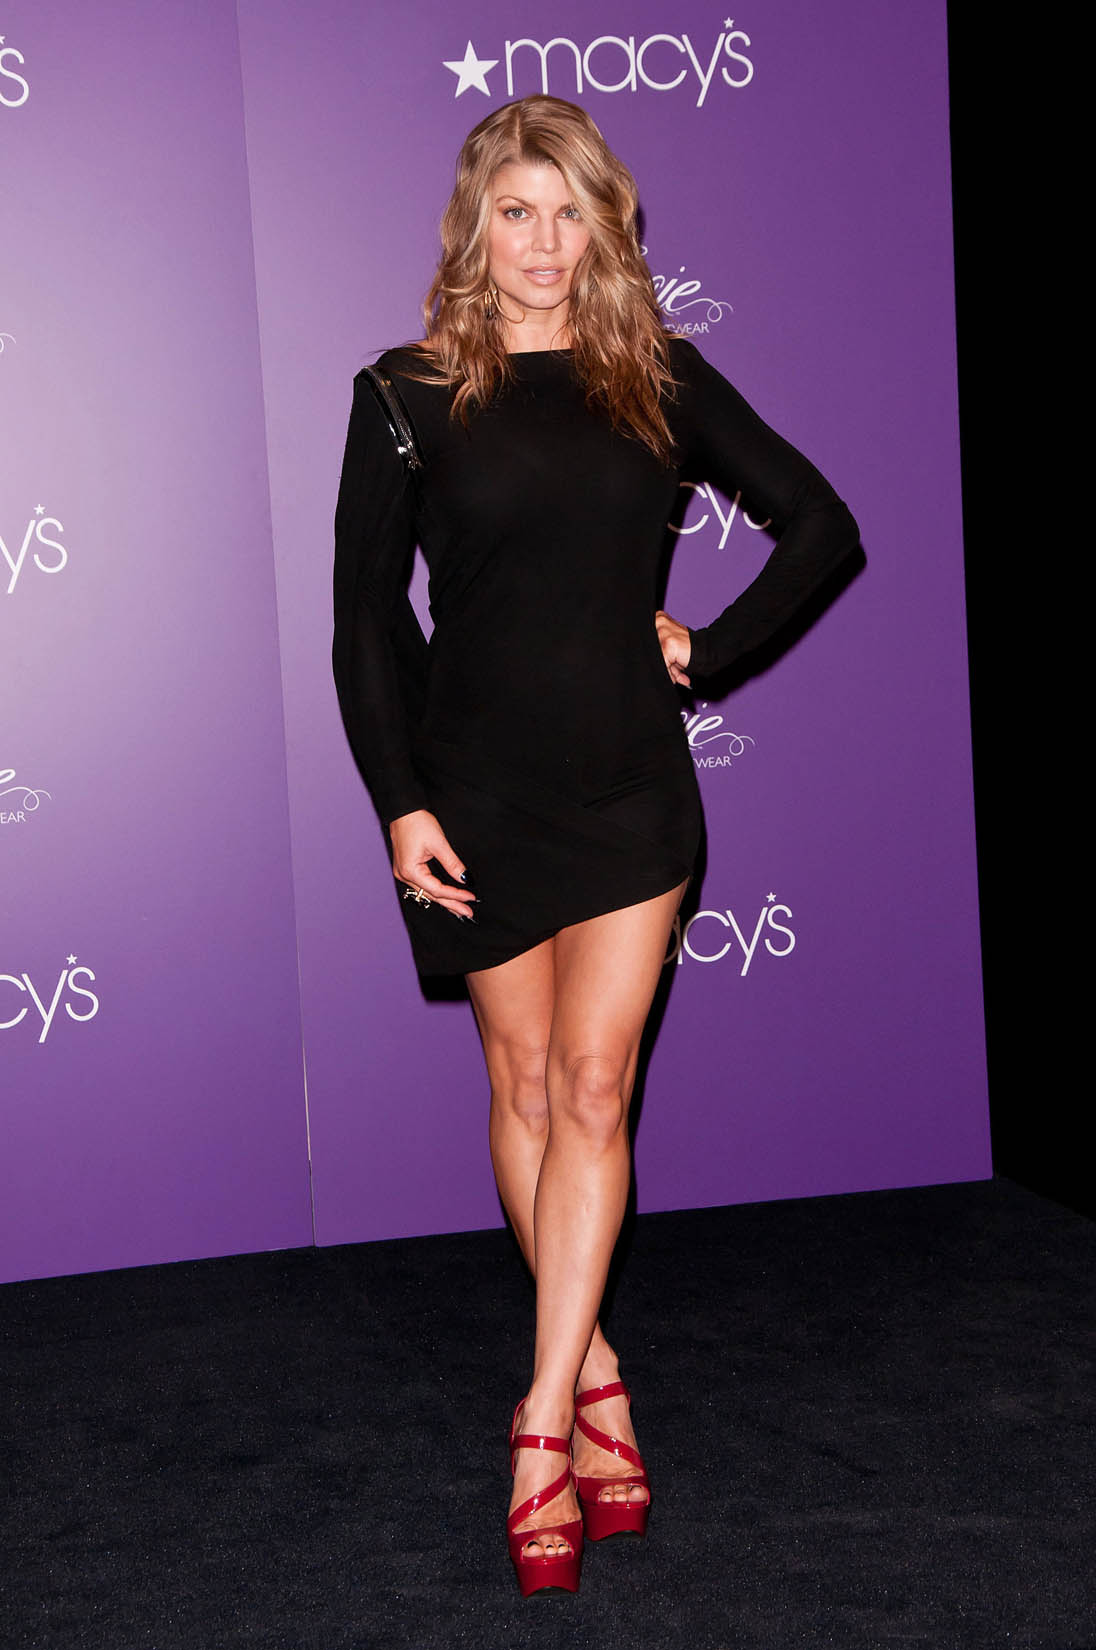 861650f1c3f Fergie Has Beautiful Legs in a Little Black Dress and Sky High Heels ...